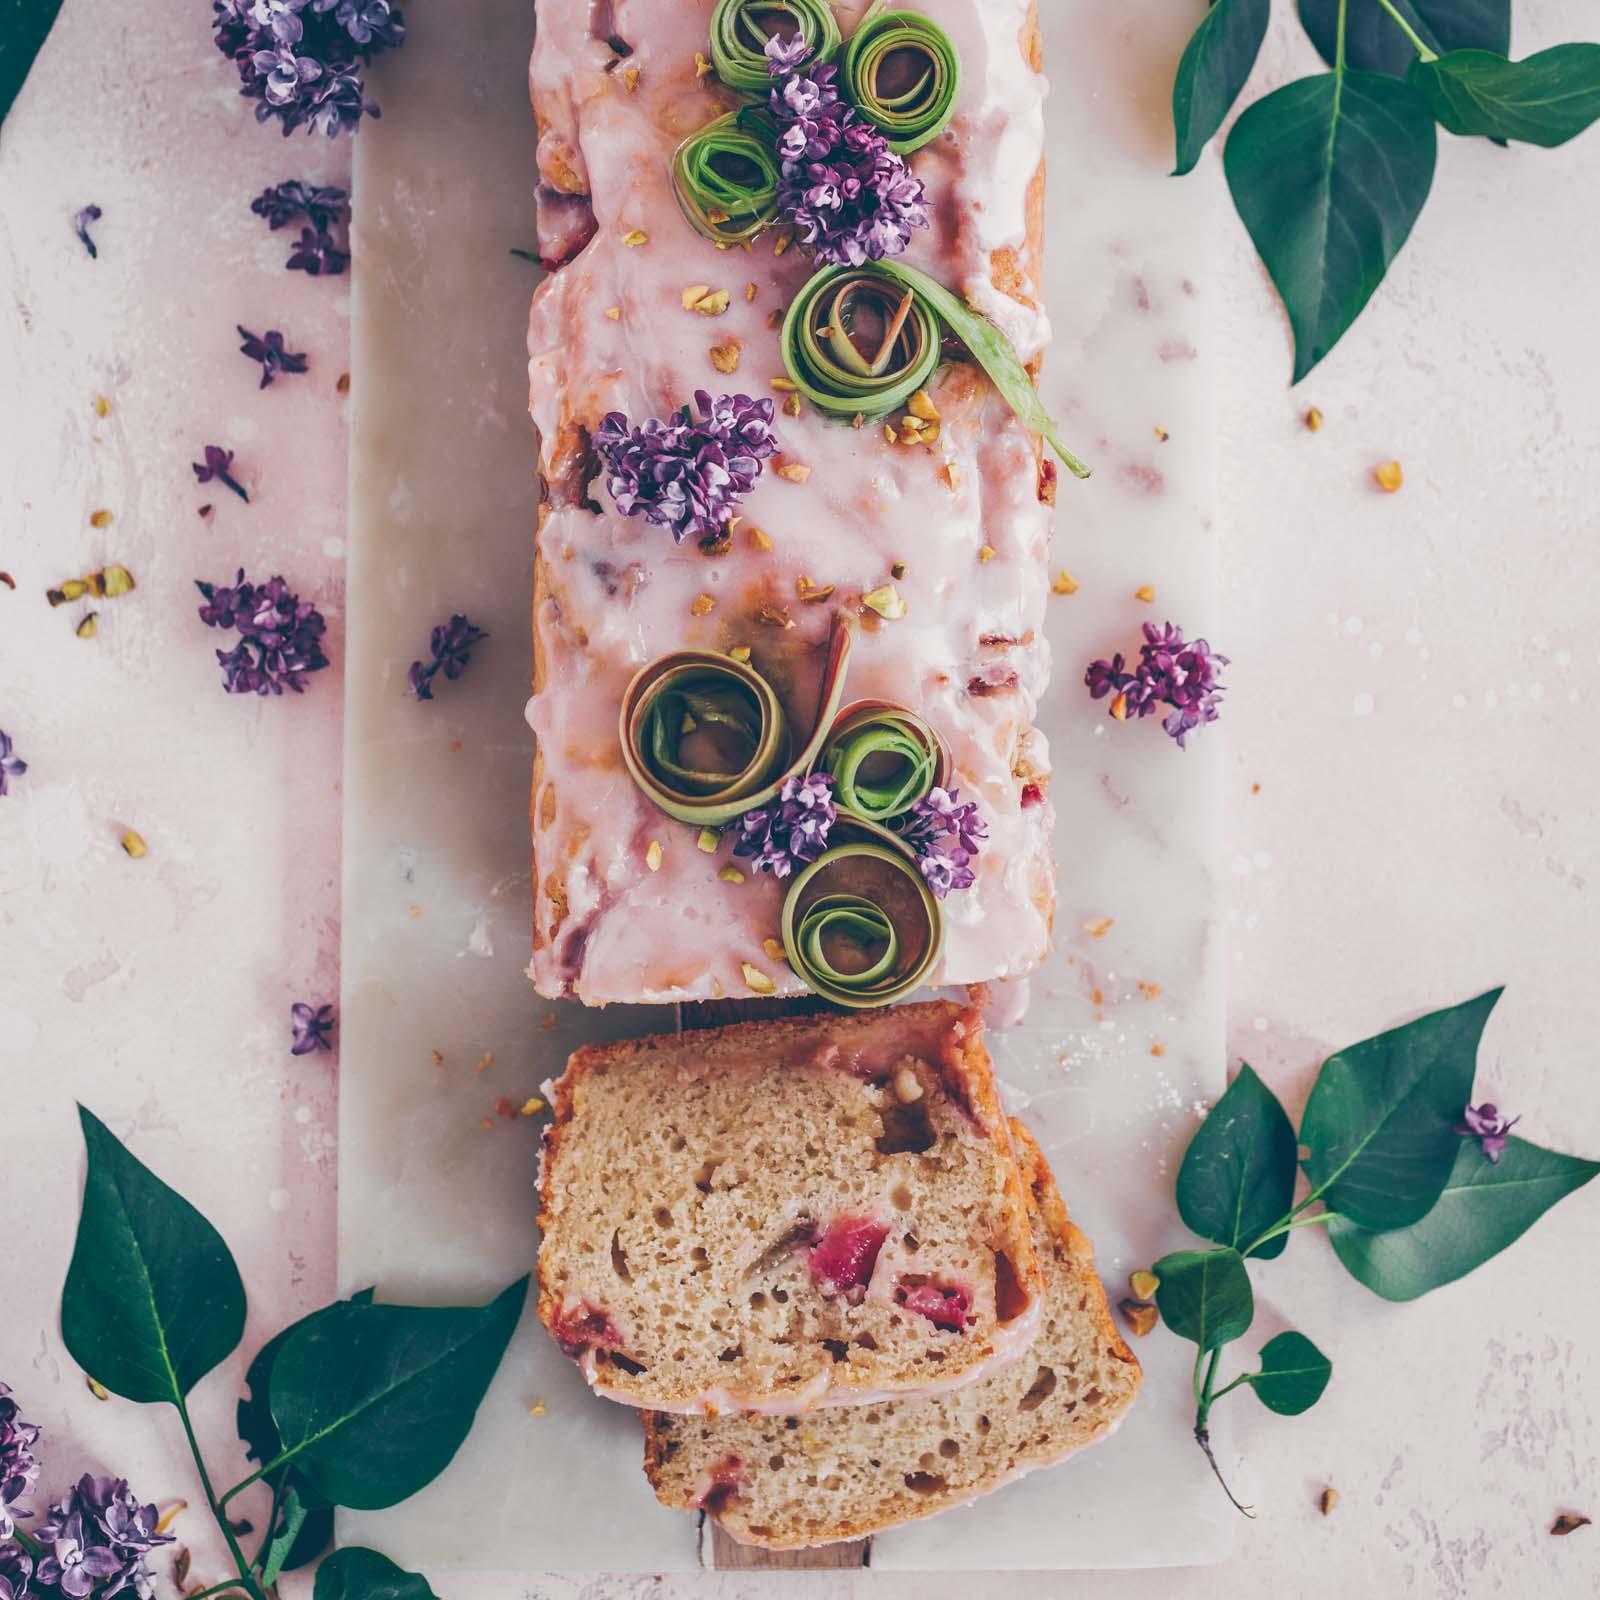 Veganer Rhabarber-Joghurt Kuchen